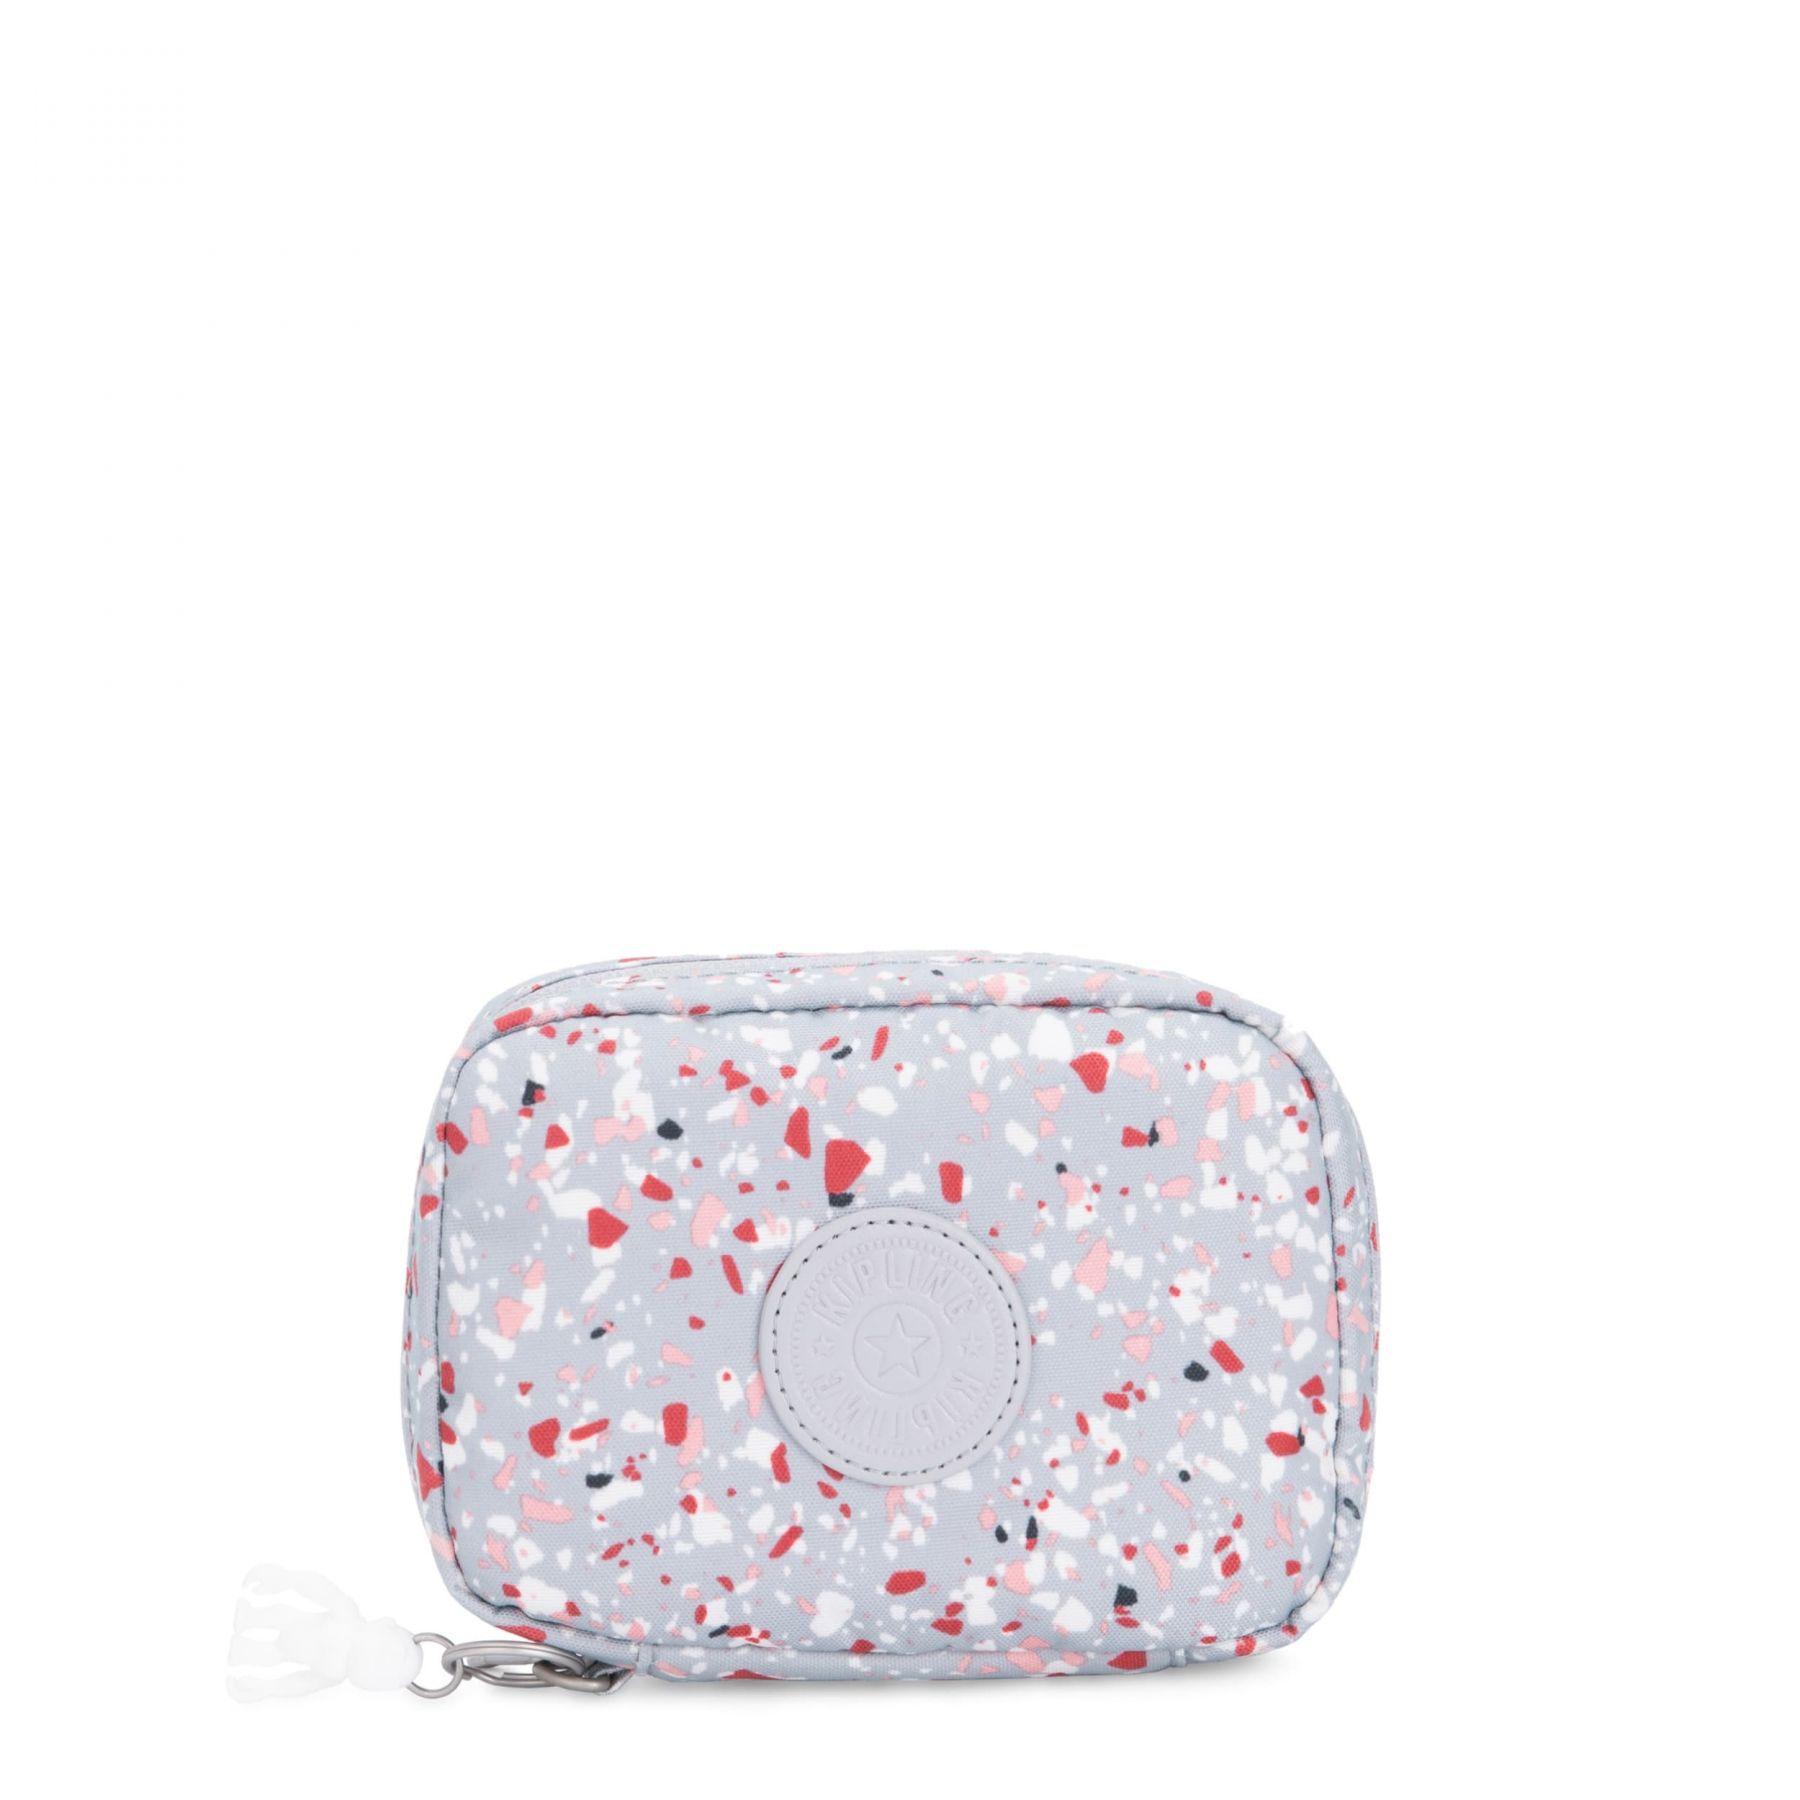 Necessaire Porta Joia Lajas Kipling Speckled